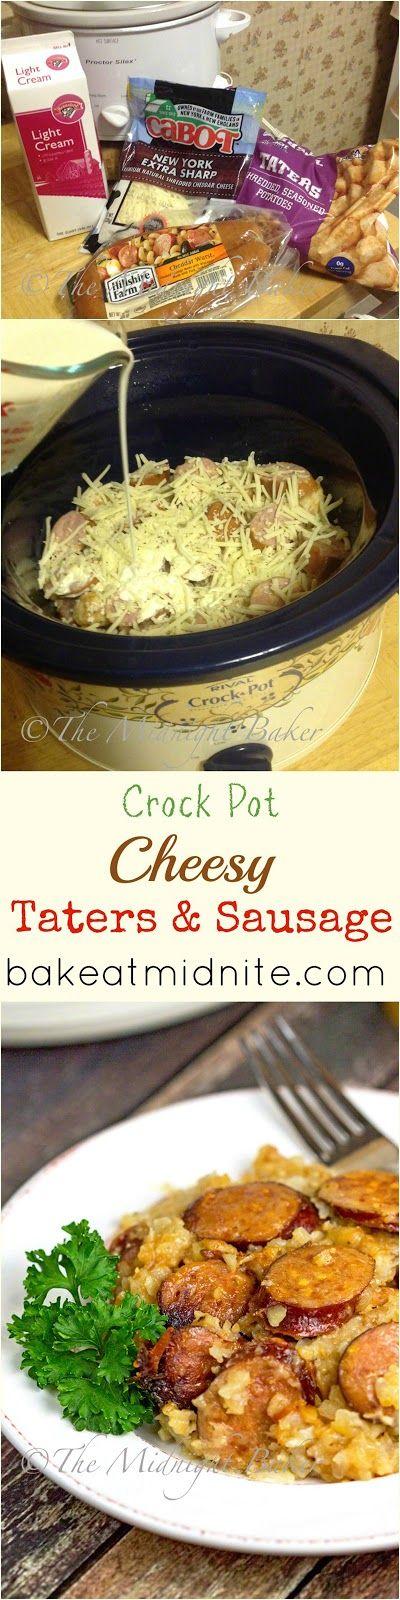 Crock Pot Cheesy Taters & Sausage | bakeatmidnite.com